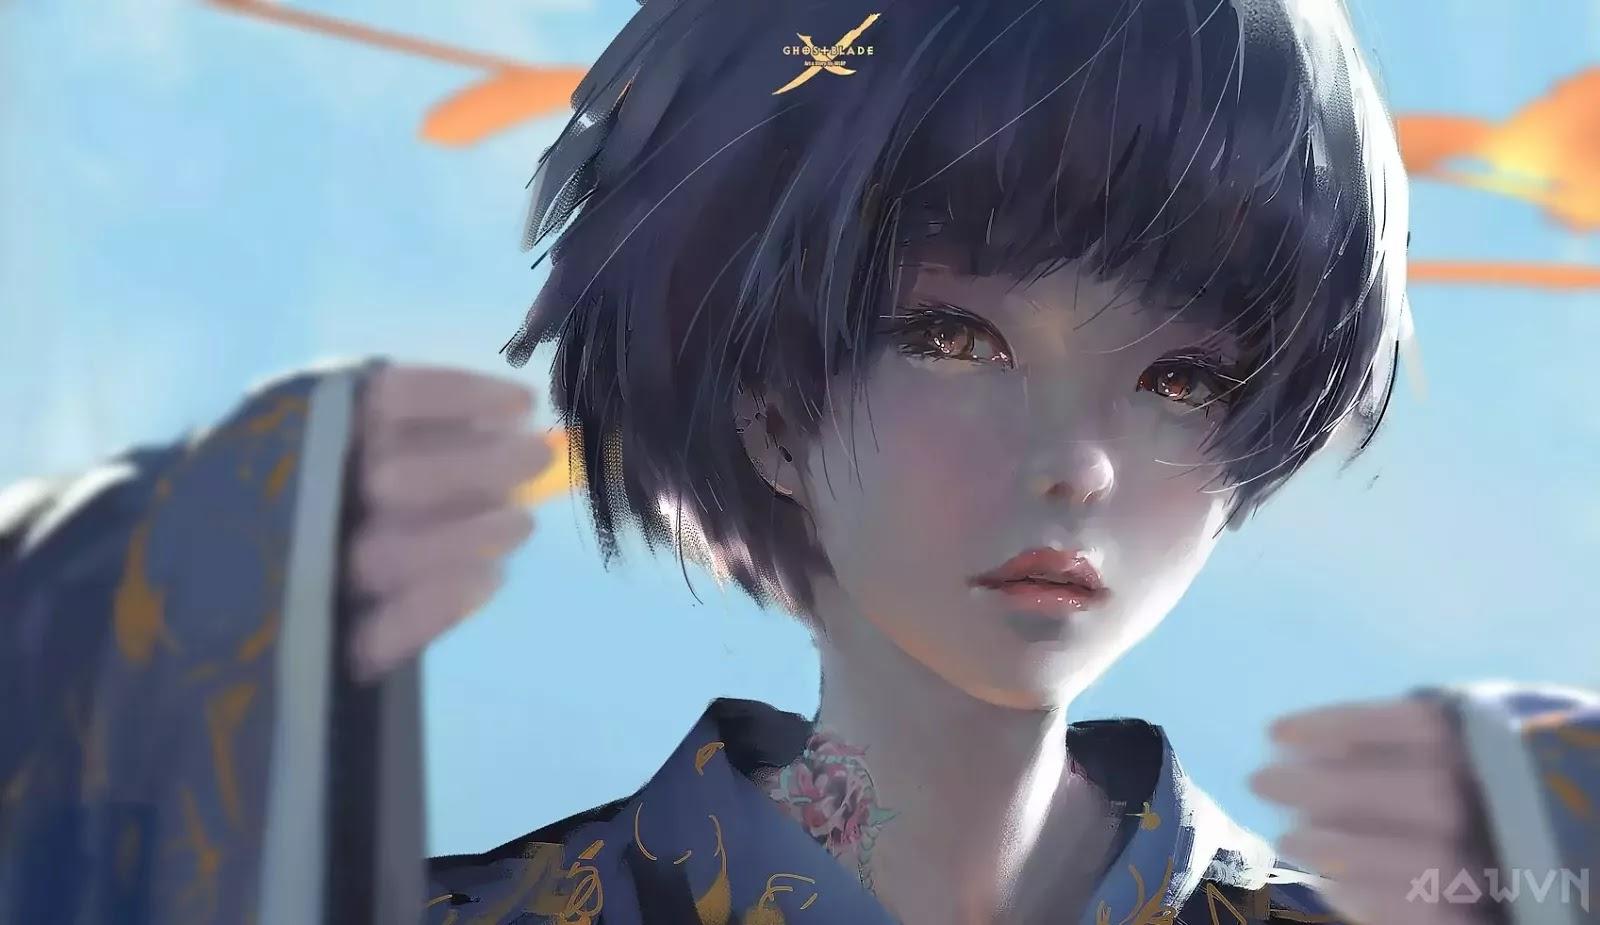 30 AowVN.org m - [ Hình Nền ] Anime Cực Đẹp by Wlop | Wallpaper Premium / Update